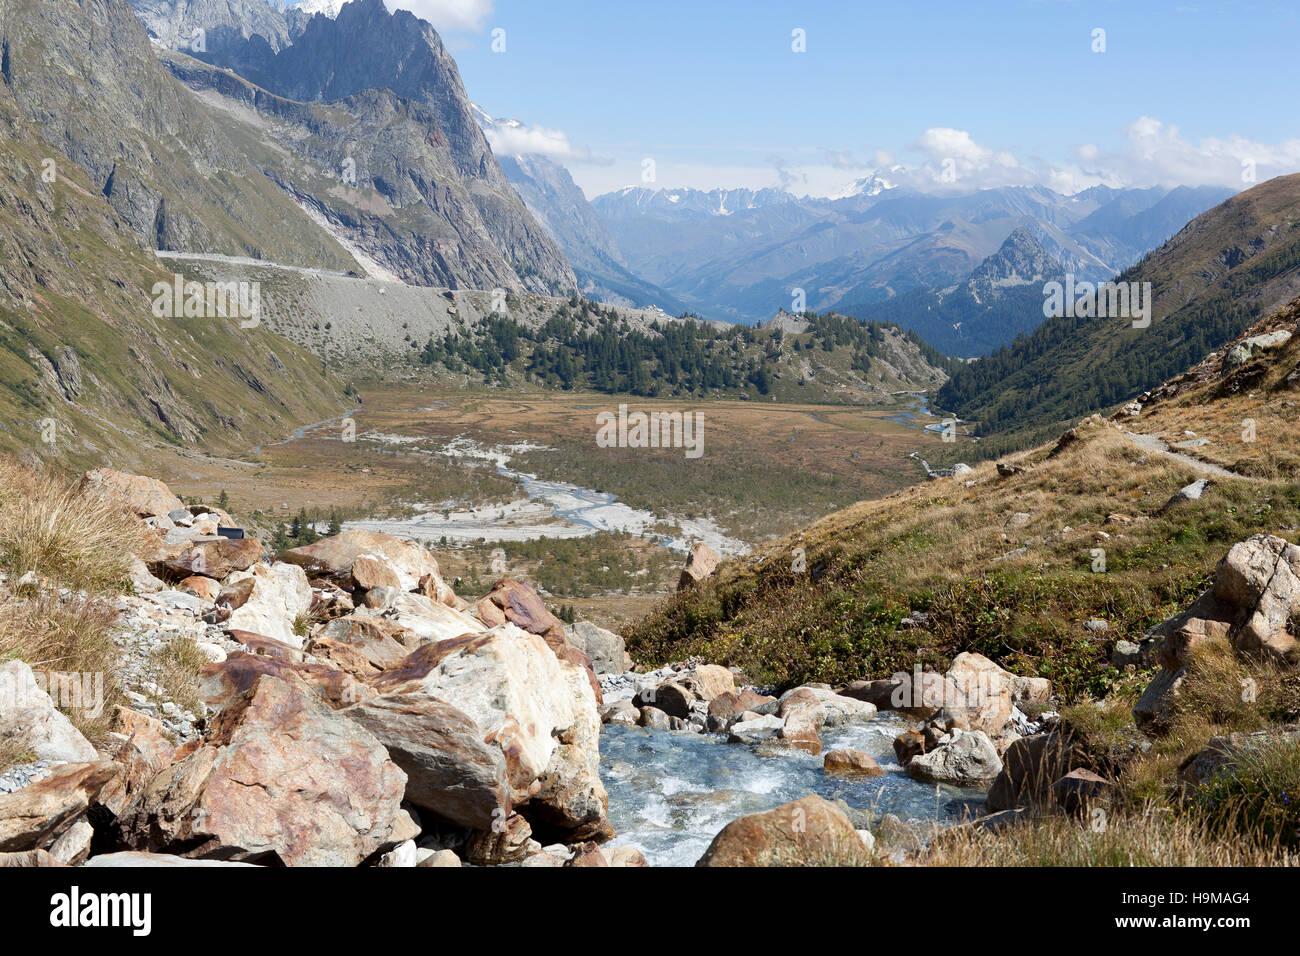 Val Veny Valle d'Aosta Italy river green mountains glacier rocks summer - Stock Image